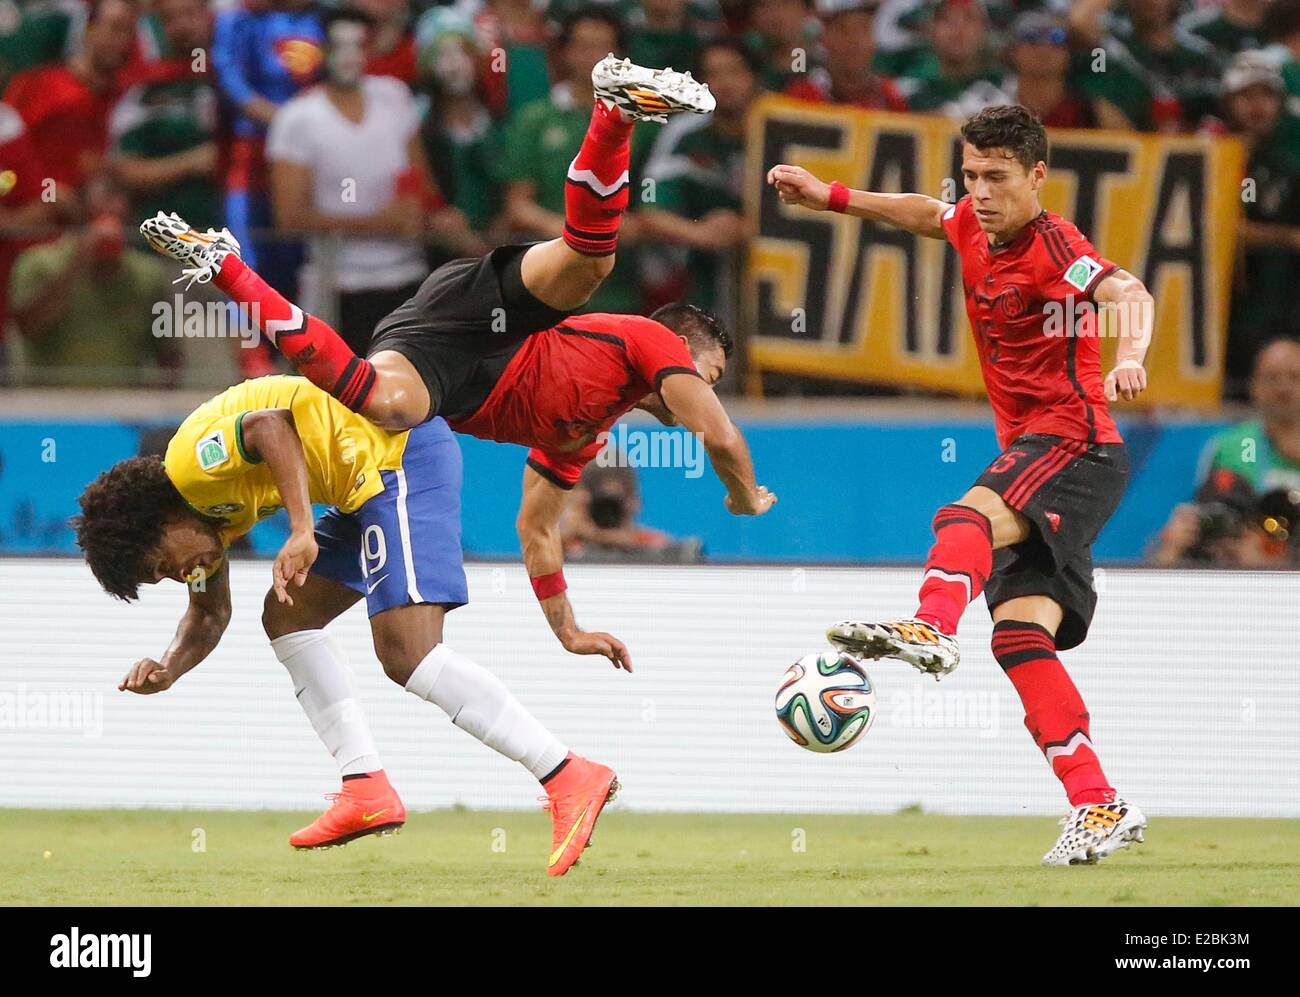 HEMANES, BRA 18 Zweikampf , Aktion um den Ball gegen Fabian MARCO, Mex 8 Moreno HECTOR, Mex 15  BRASILIEN - MEXIKO - Stock Image